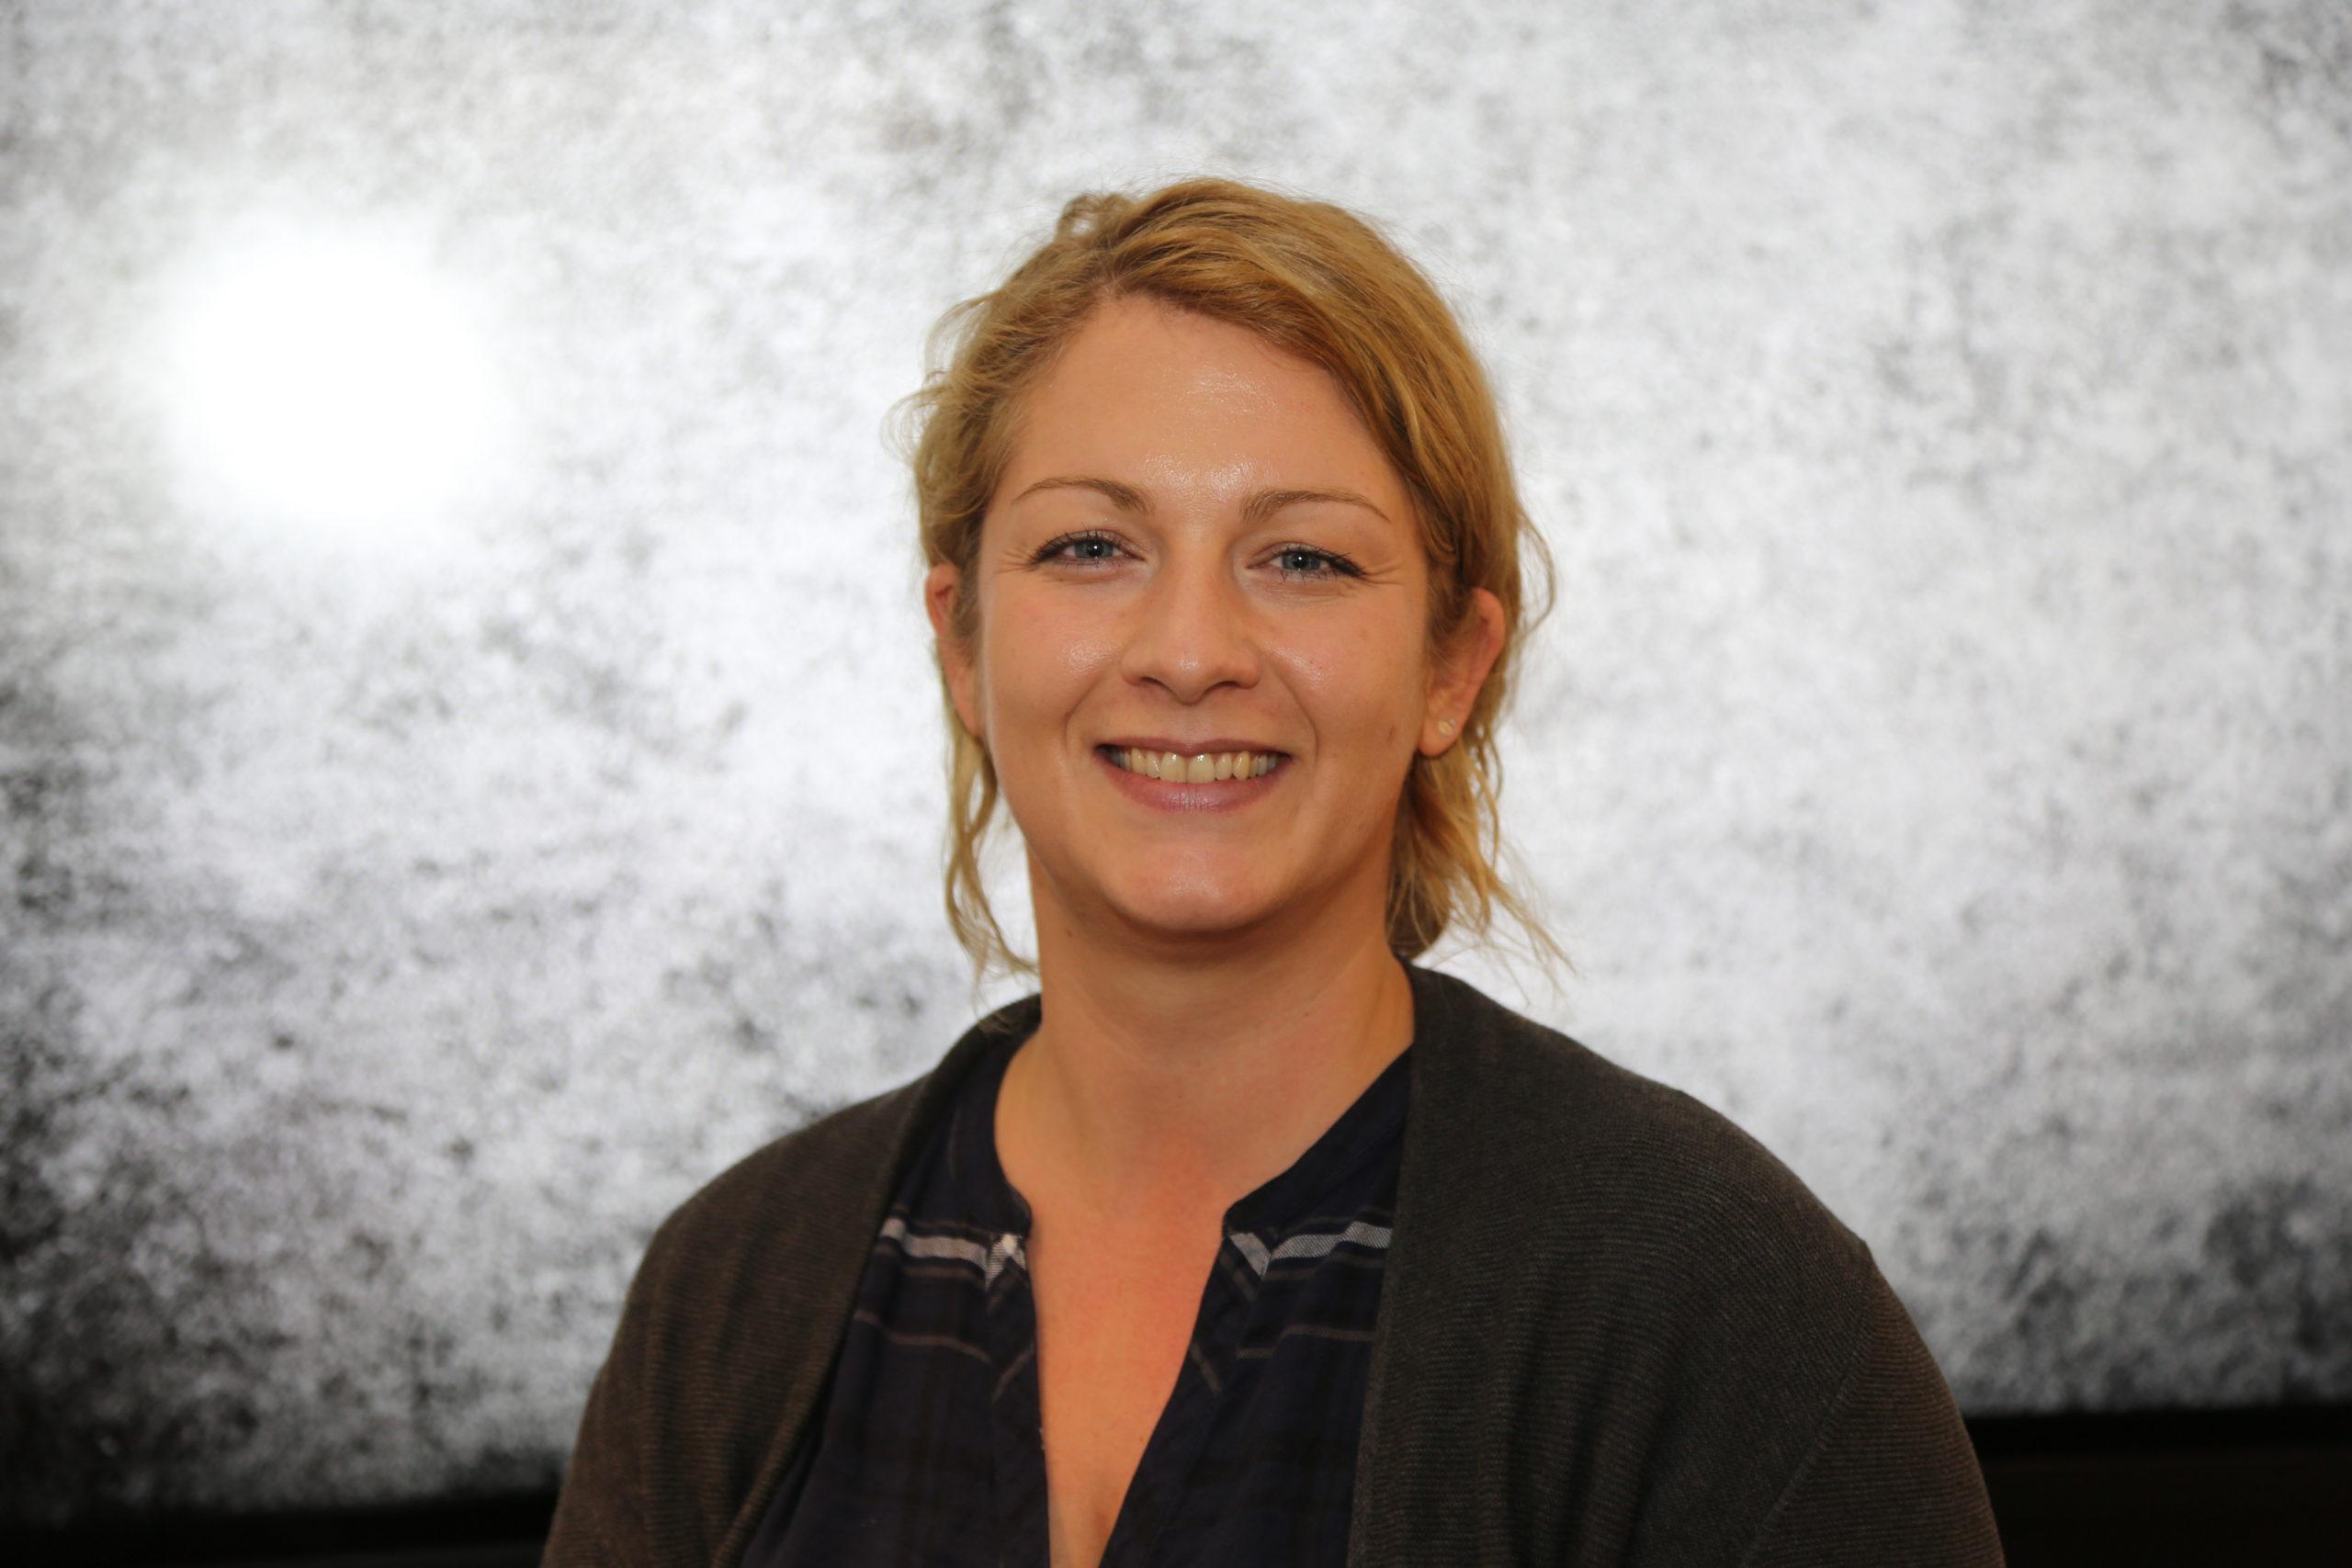 Susanne Voss